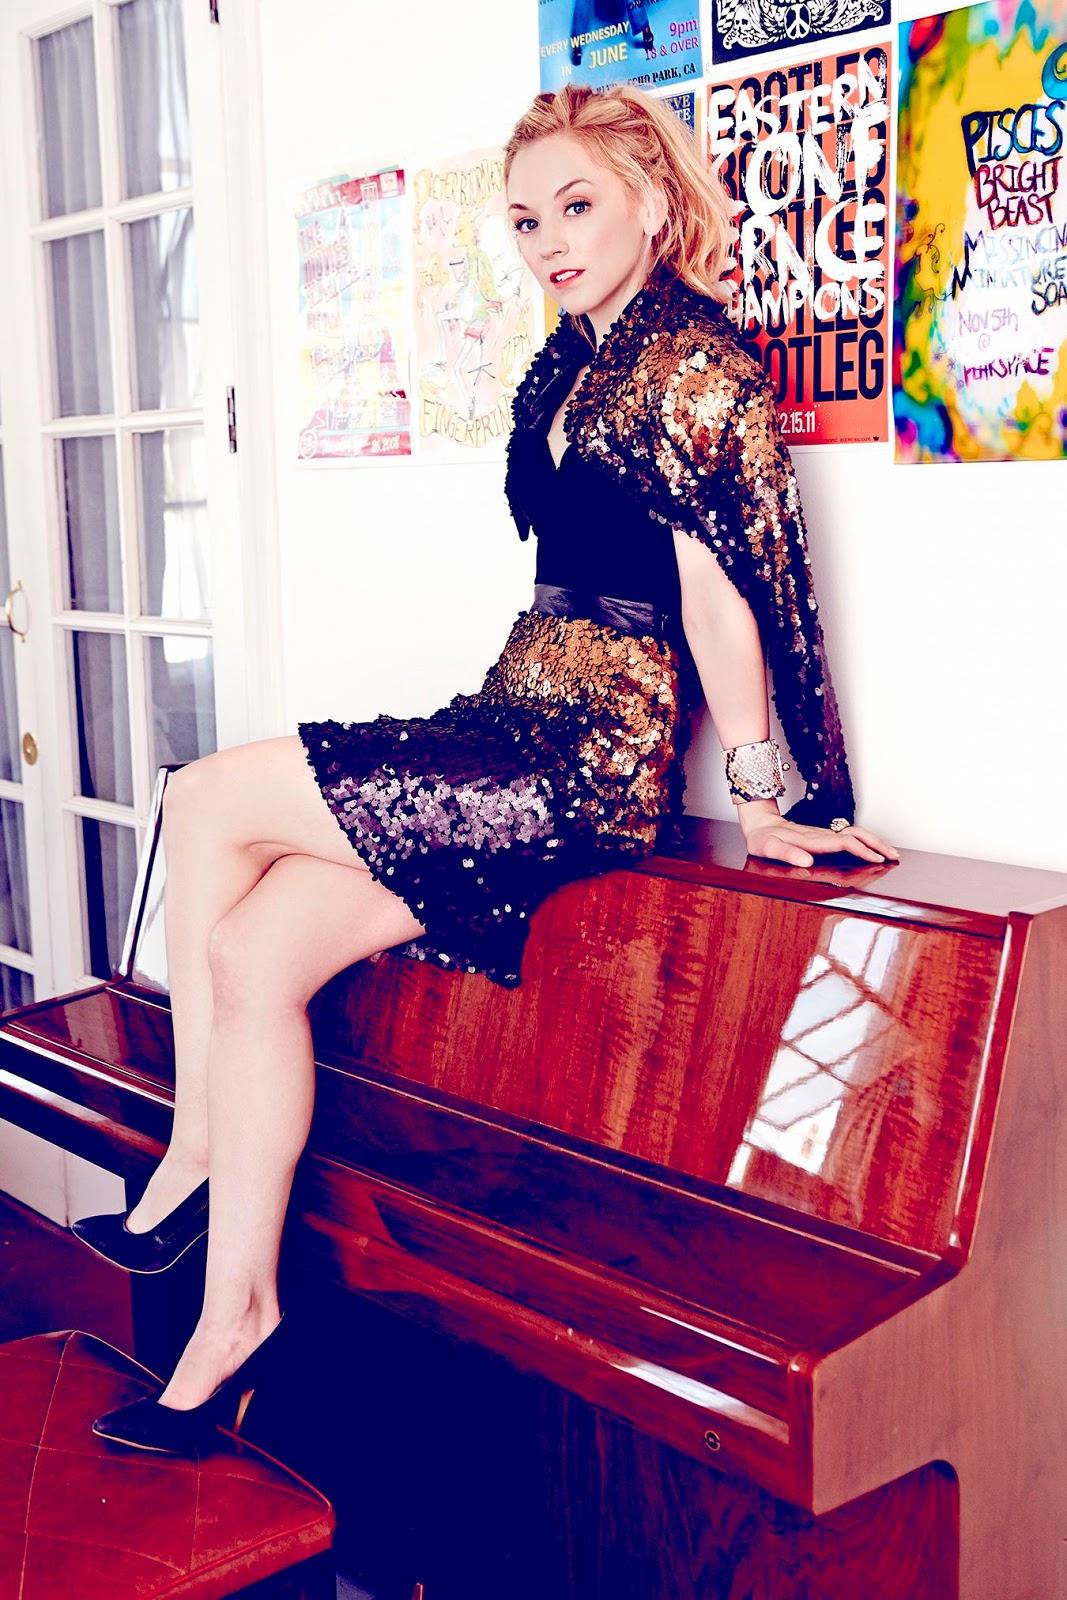 Emily Kinney Legs - 2019 year